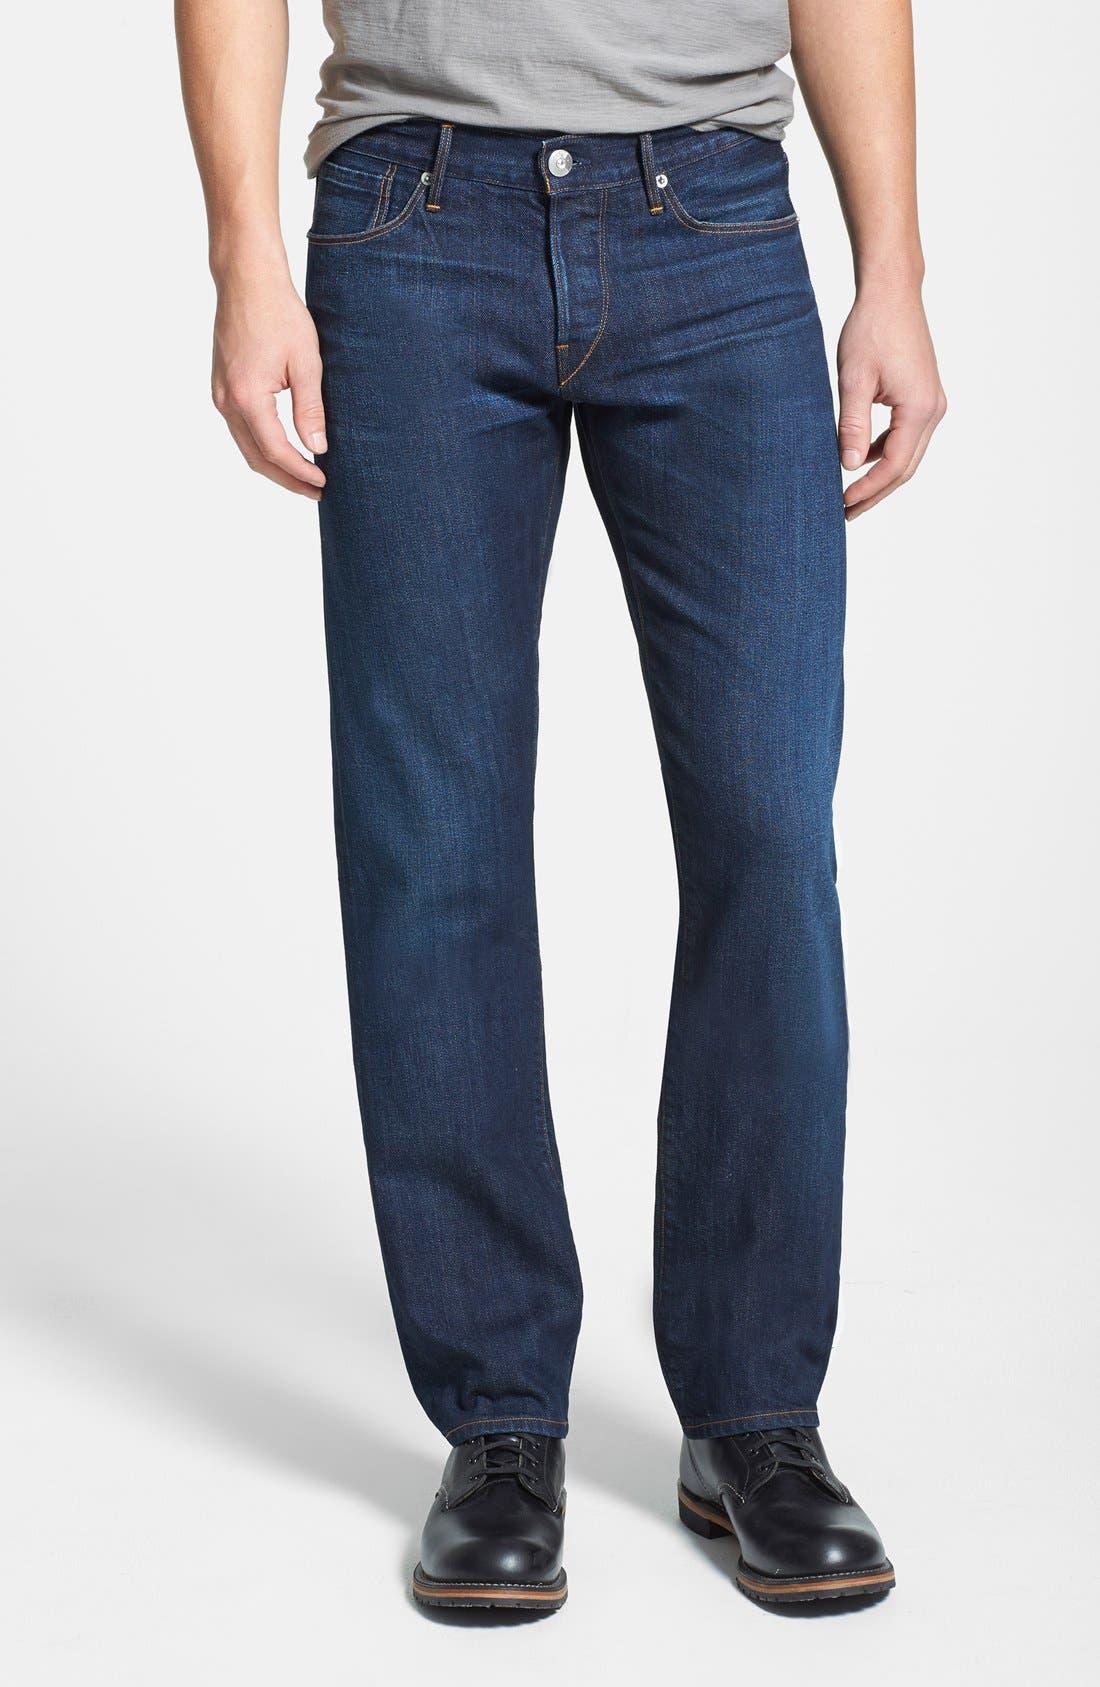 'M4' Straight Leg Selvedge Jeans,                             Main thumbnail 1, color,                             Makers